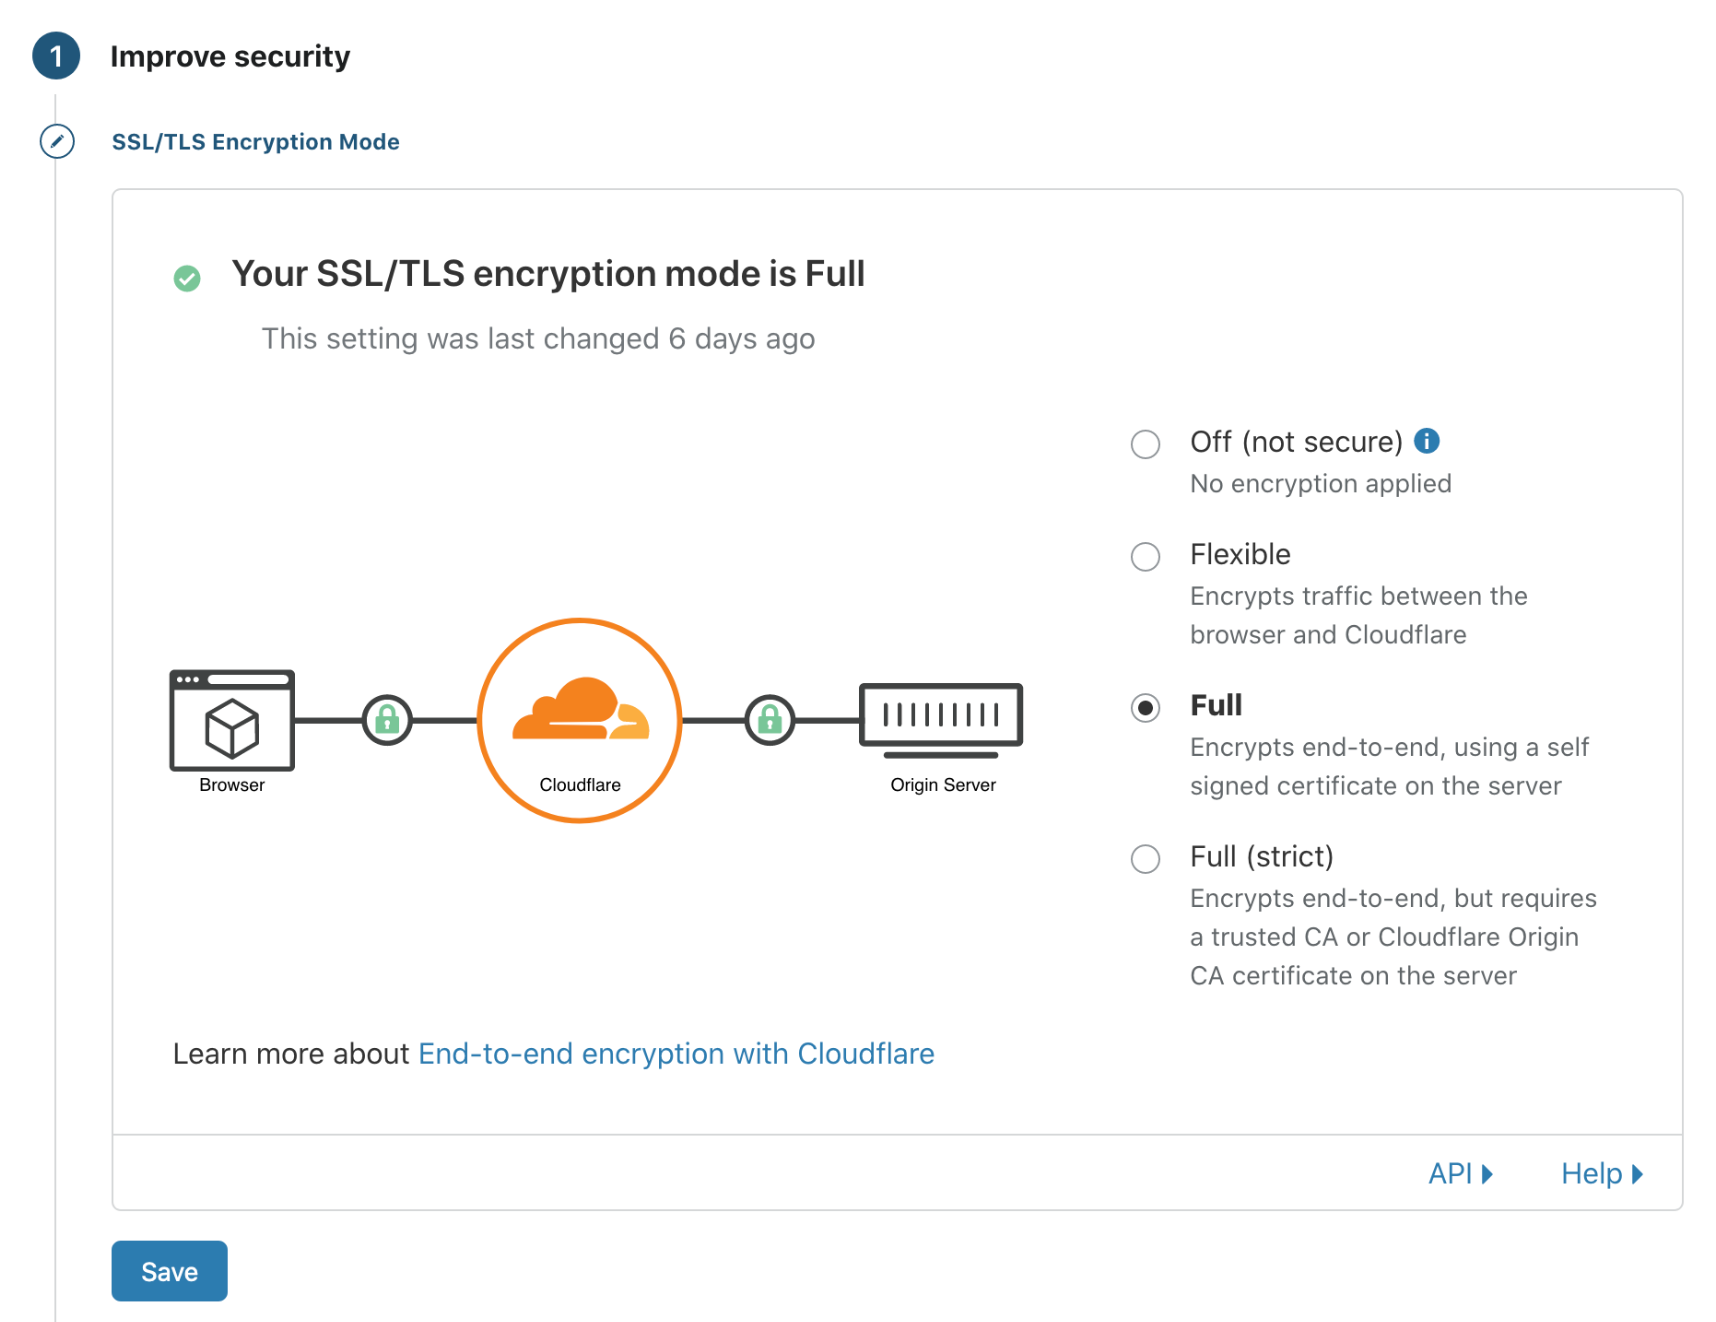 Full encryption